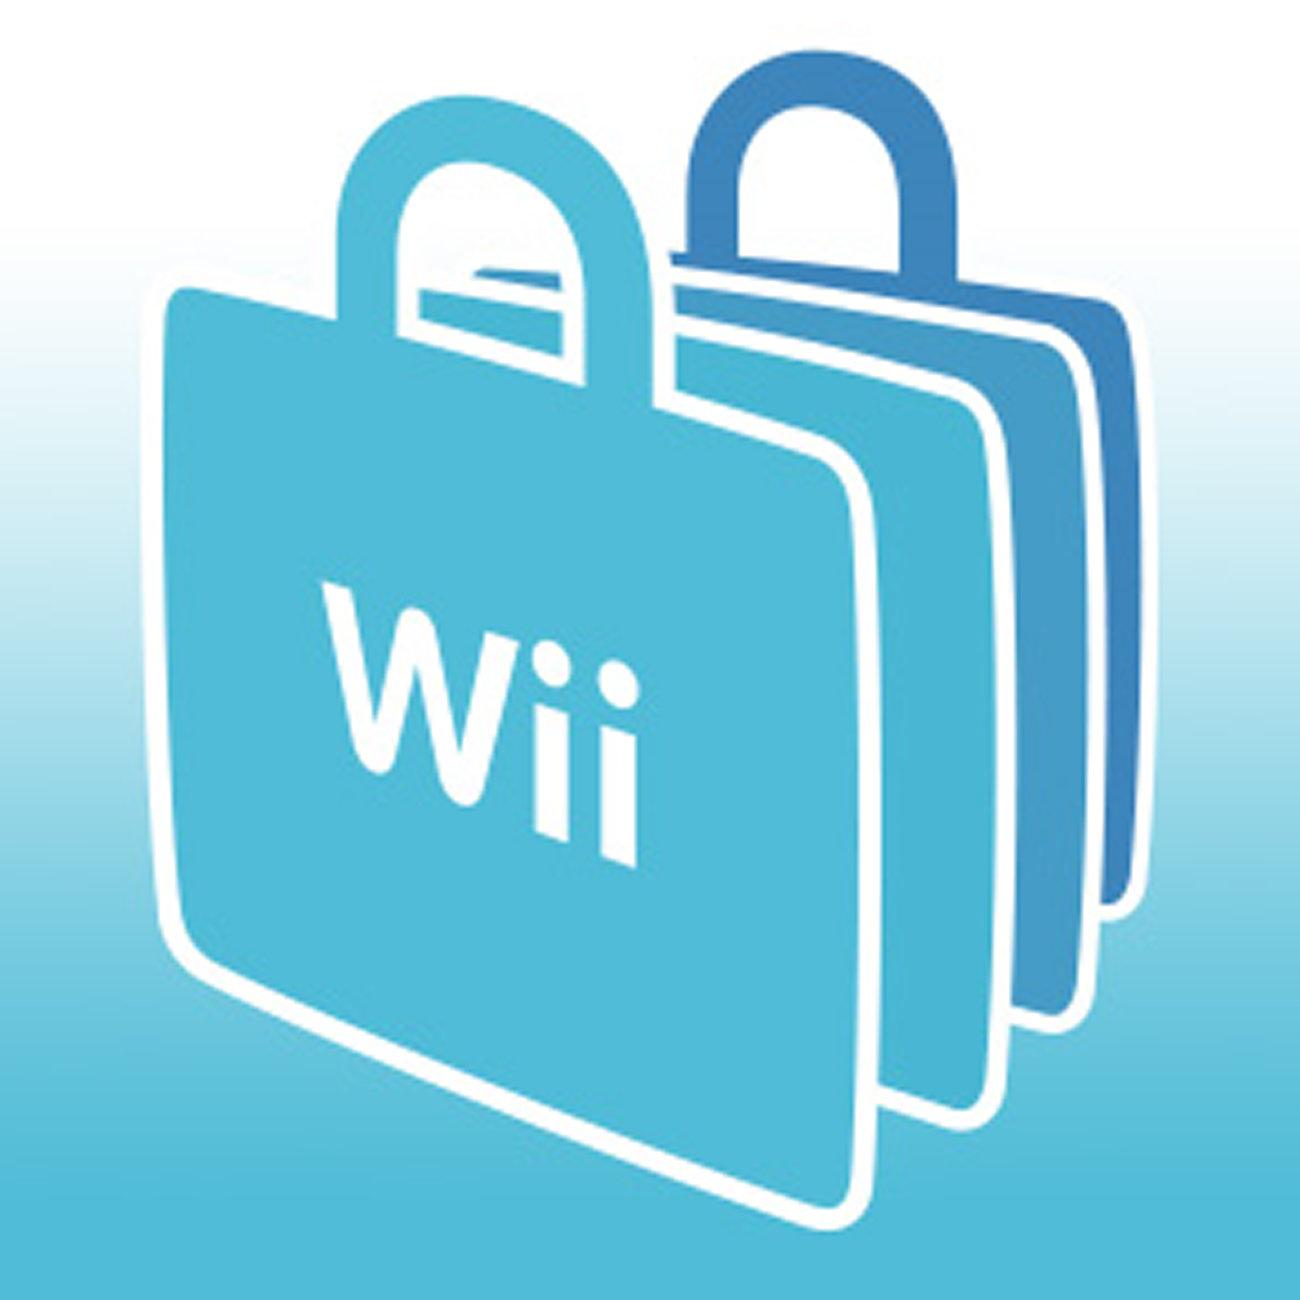 Wiiショッピングチャンネルが終了、今後は払い戻し